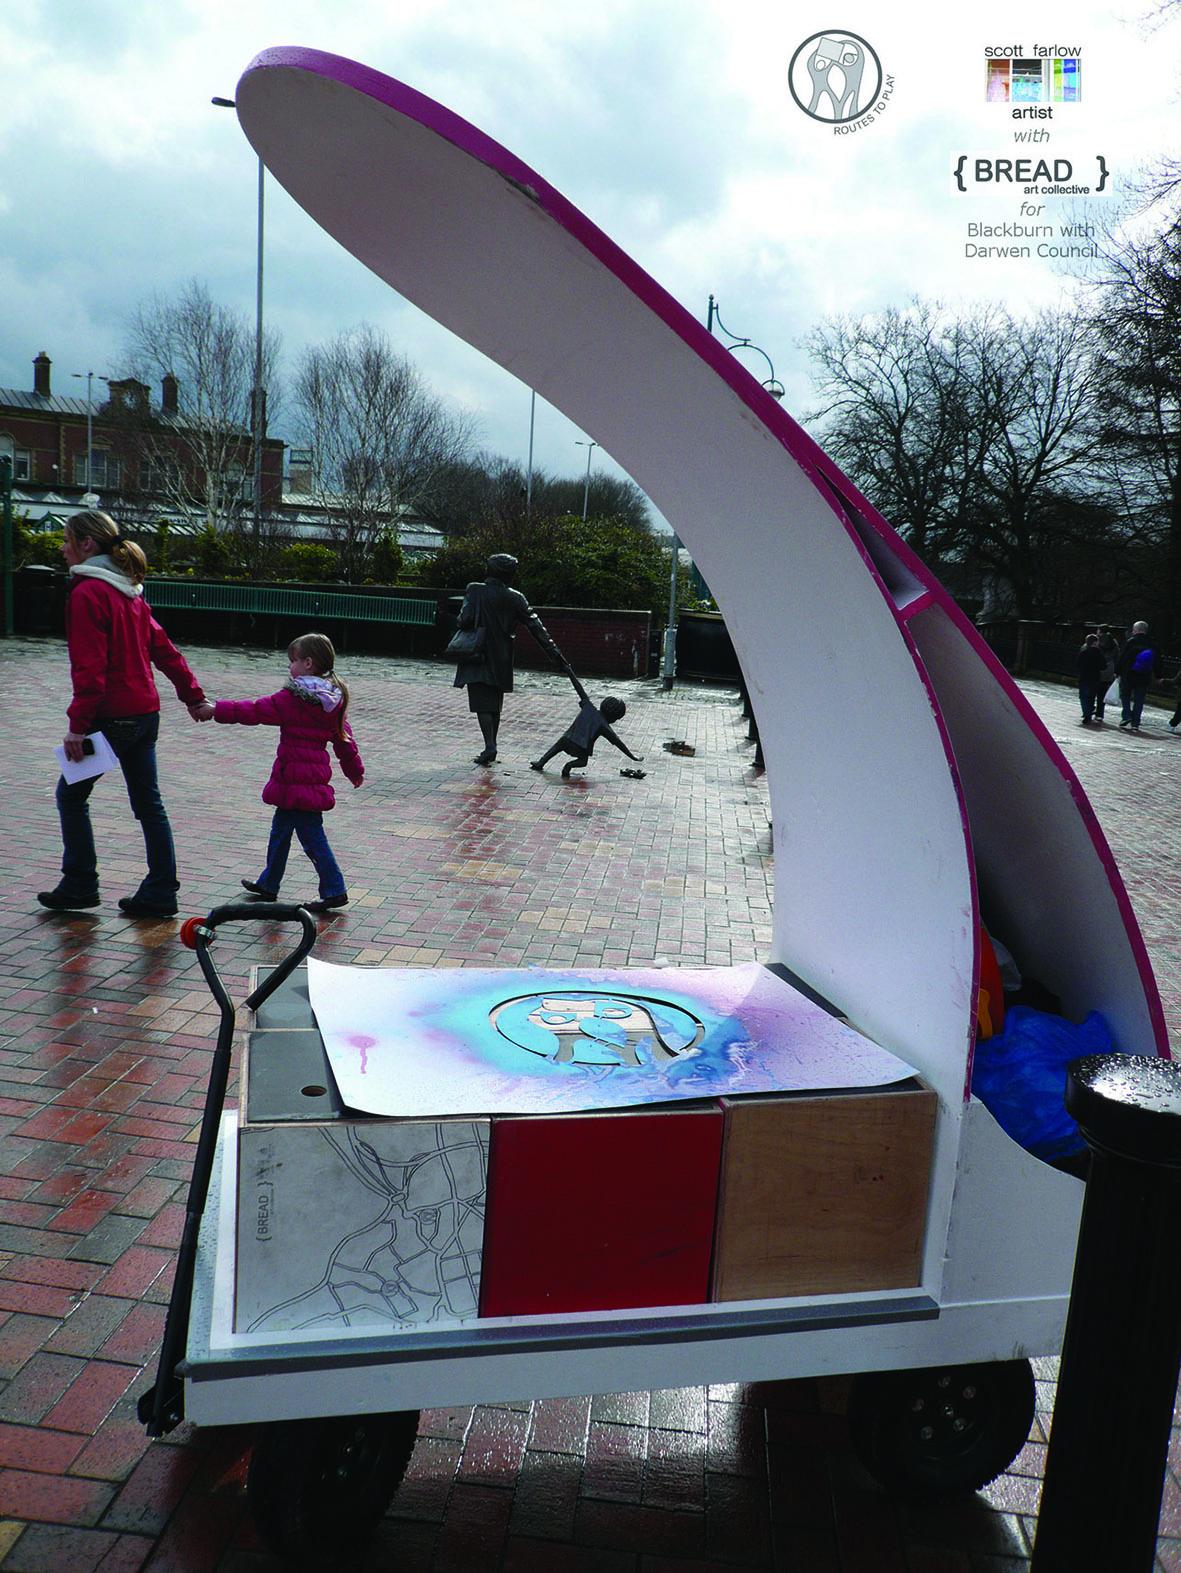 the playmobile in Blackburn